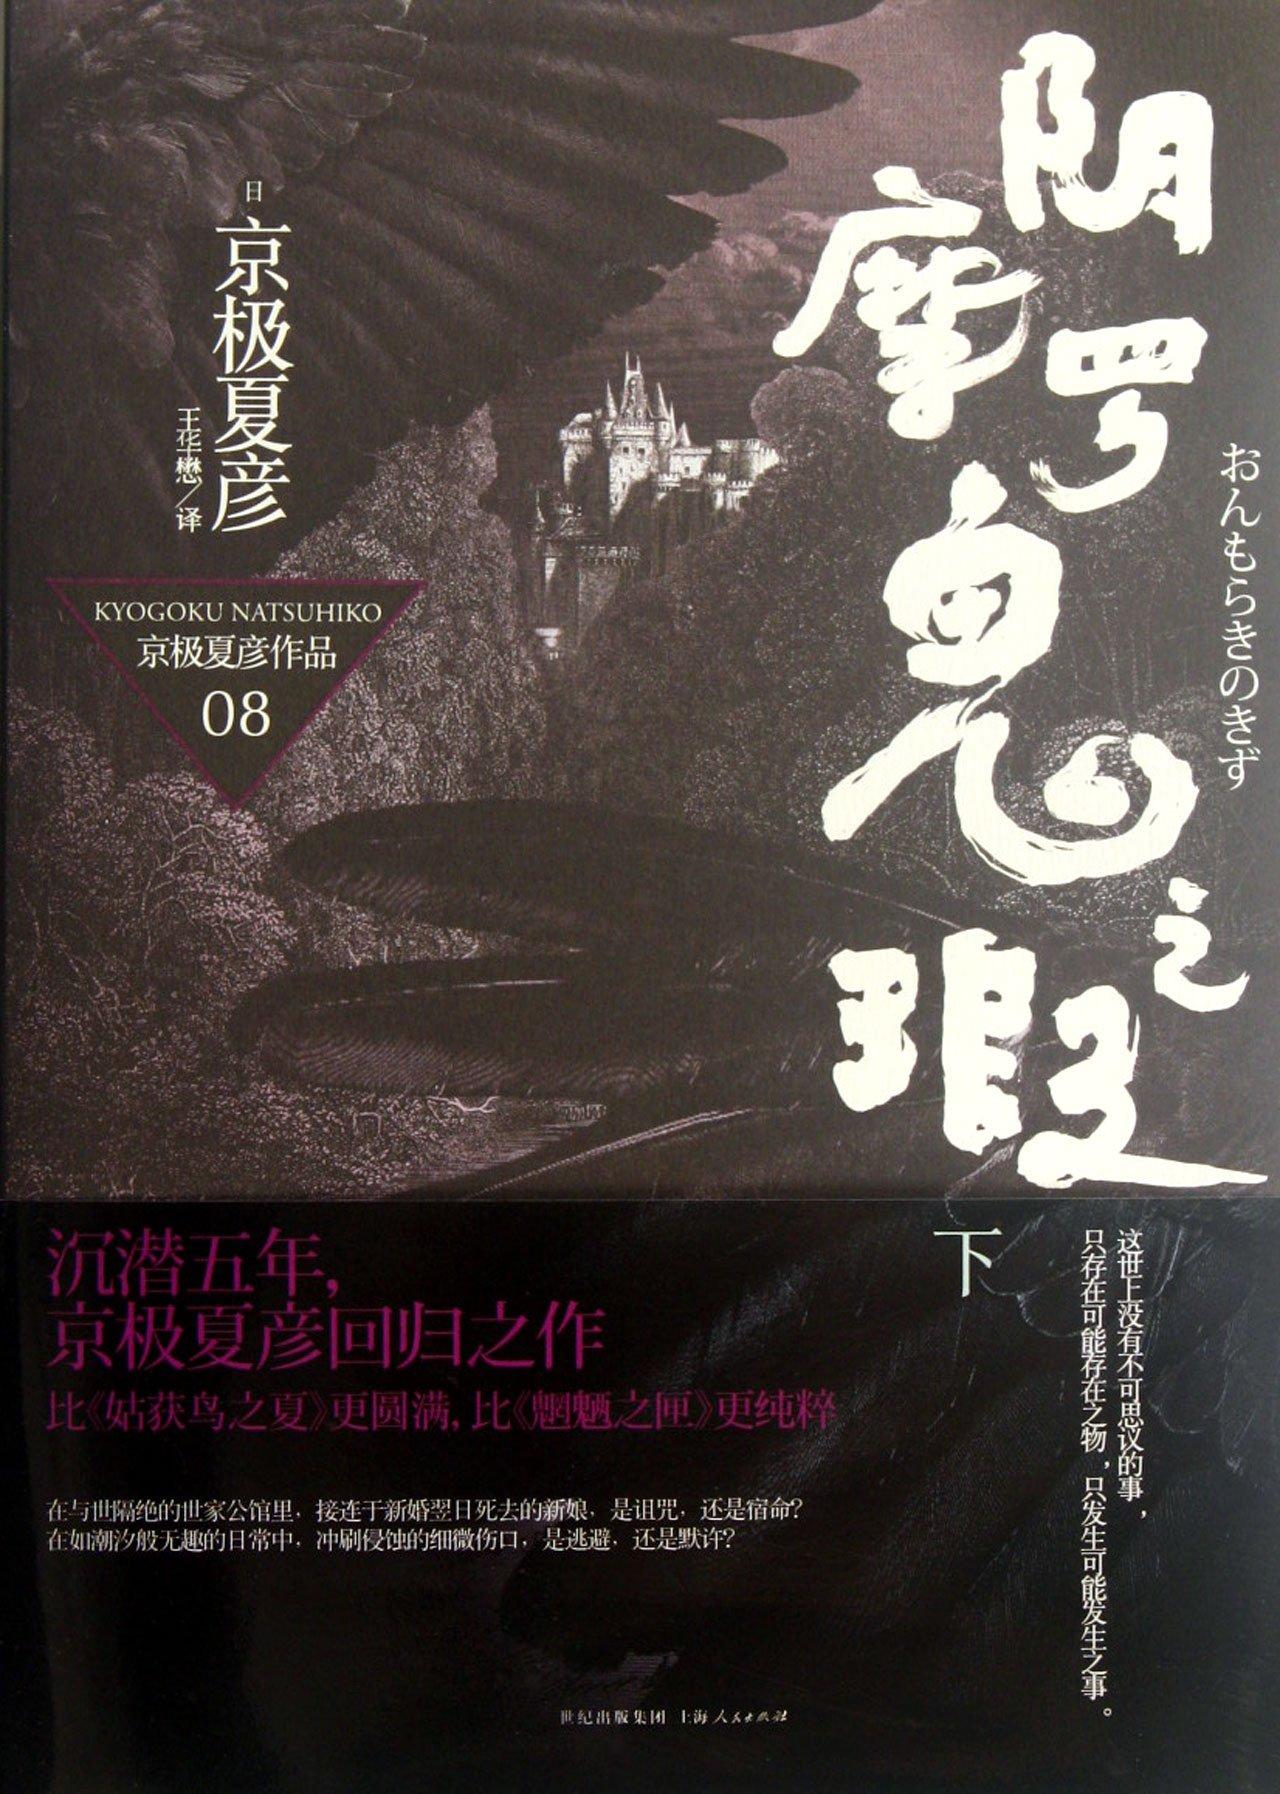 The Defect of Onmoraki Ghost Kyogoku Natsuhiko-08-Vol.2 (Chinese Edition) pdf